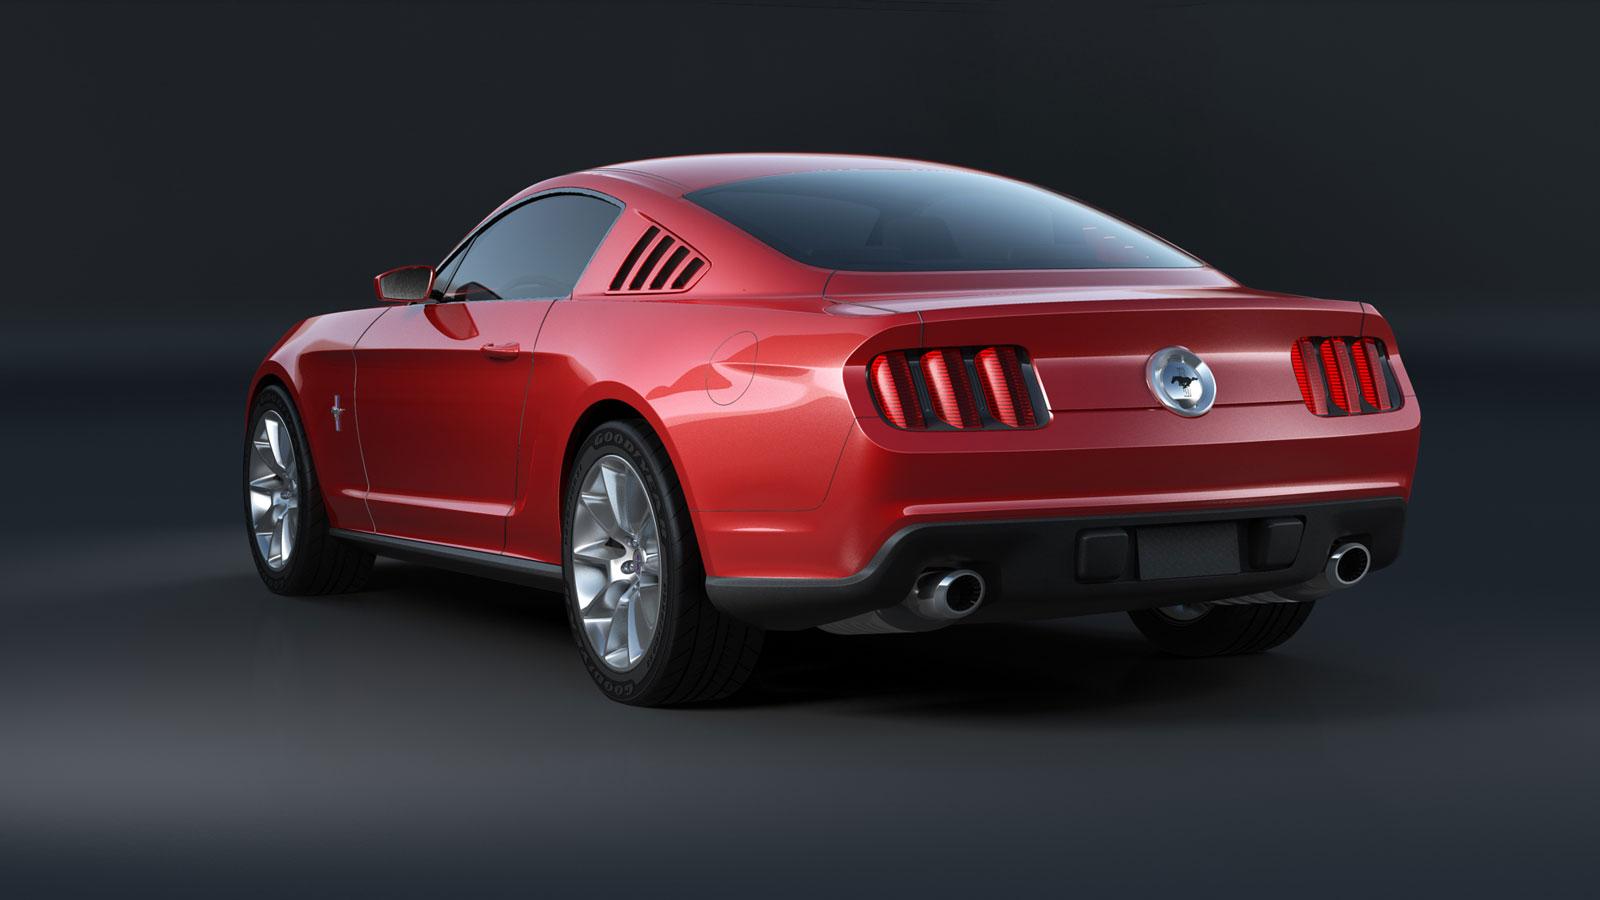 2015 ford mustang design development theme c rear car body design. Black Bedroom Furniture Sets. Home Design Ideas